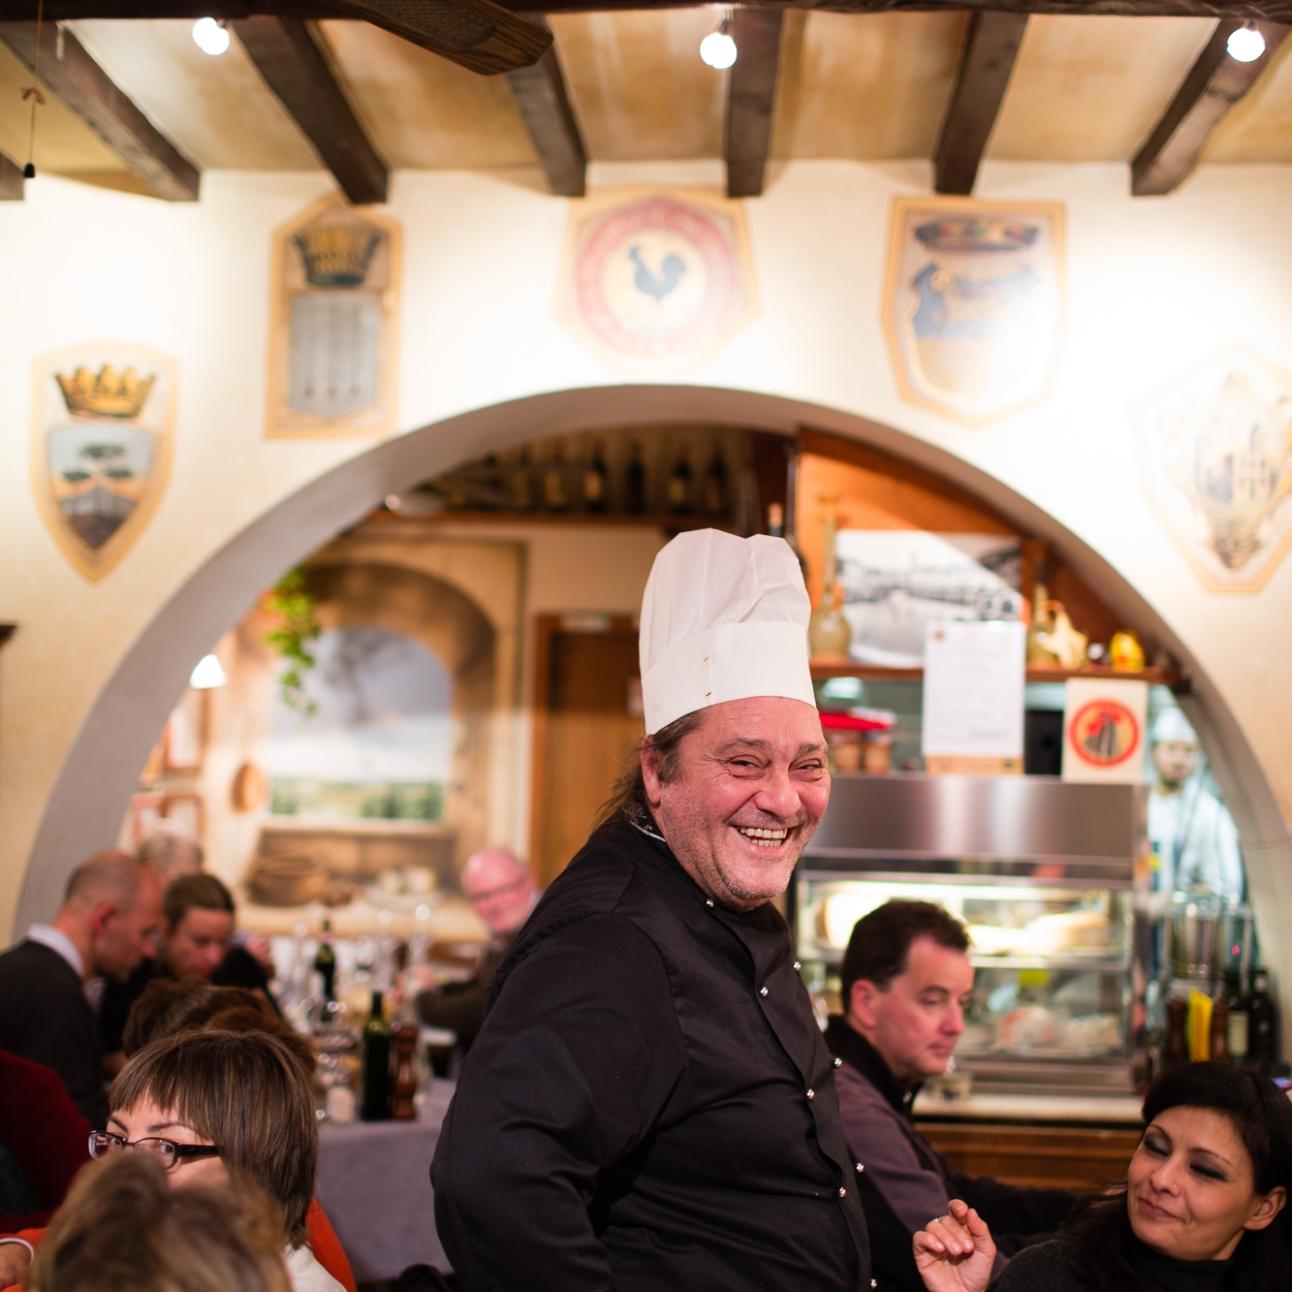 Chef Toscano Mangiando Mangiando